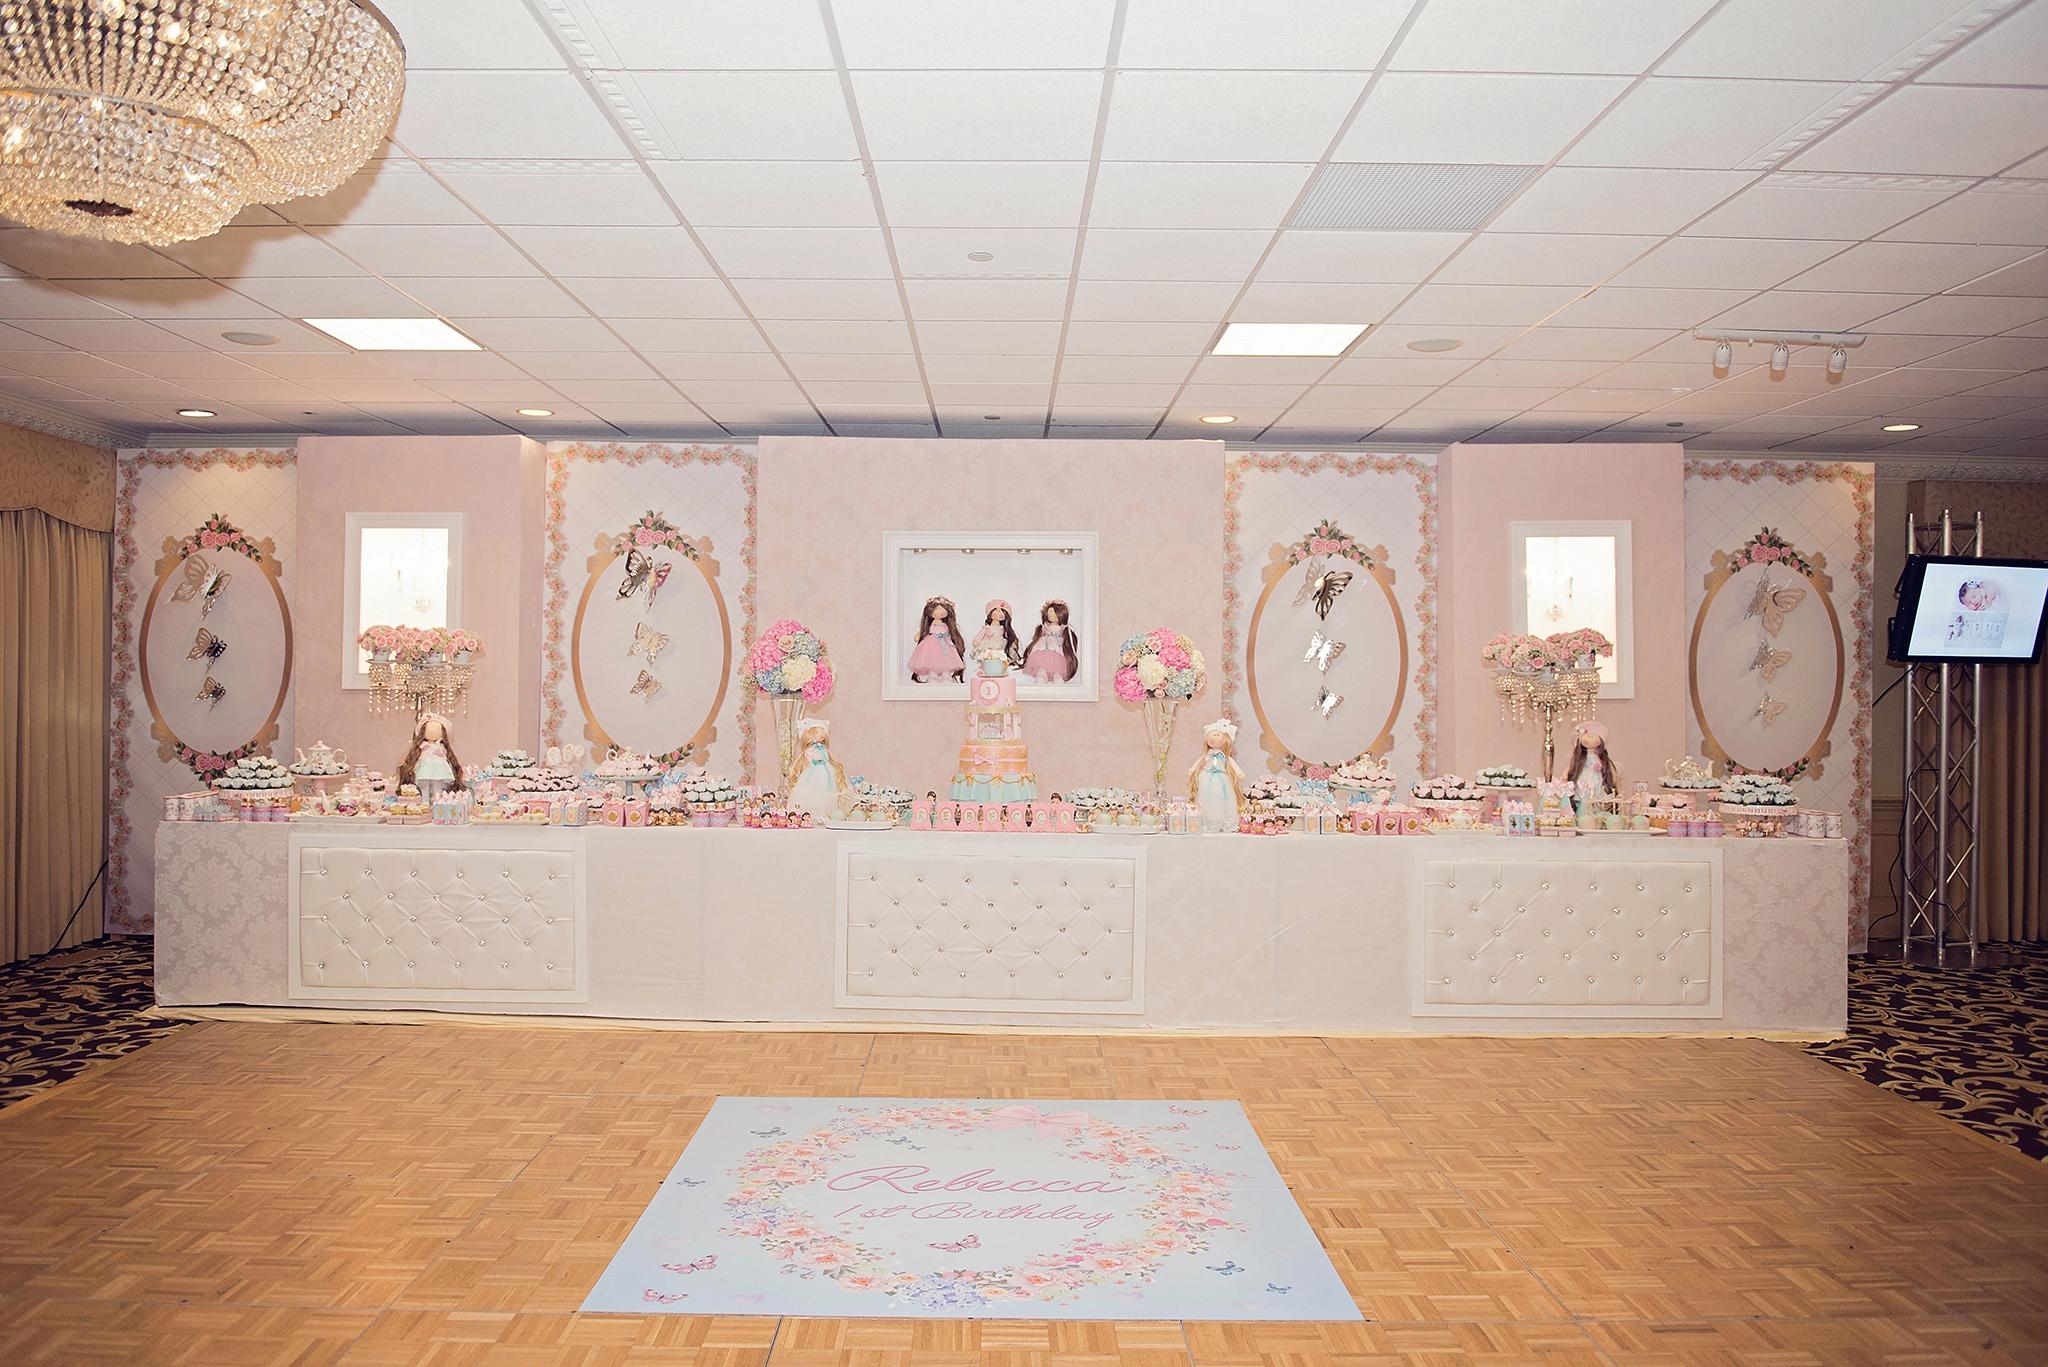 NJ-NY-cakesmash-birthday-Photographer-053.JPG